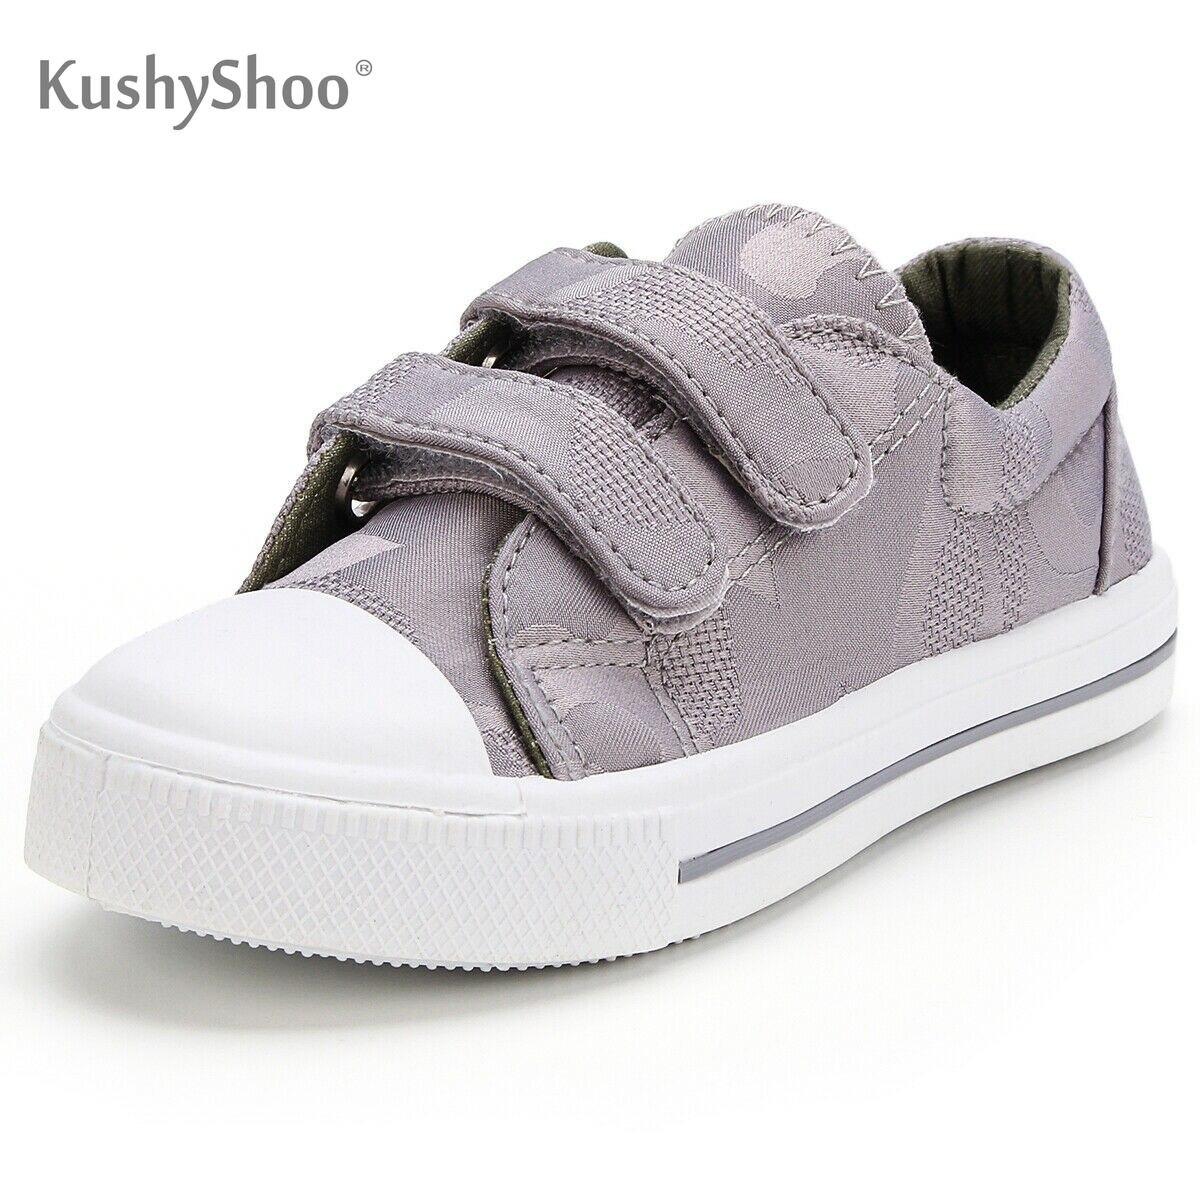 Tidal TDDLR 9 Regular US Big Kid The Childrens Place Boys Fashion Sneaker